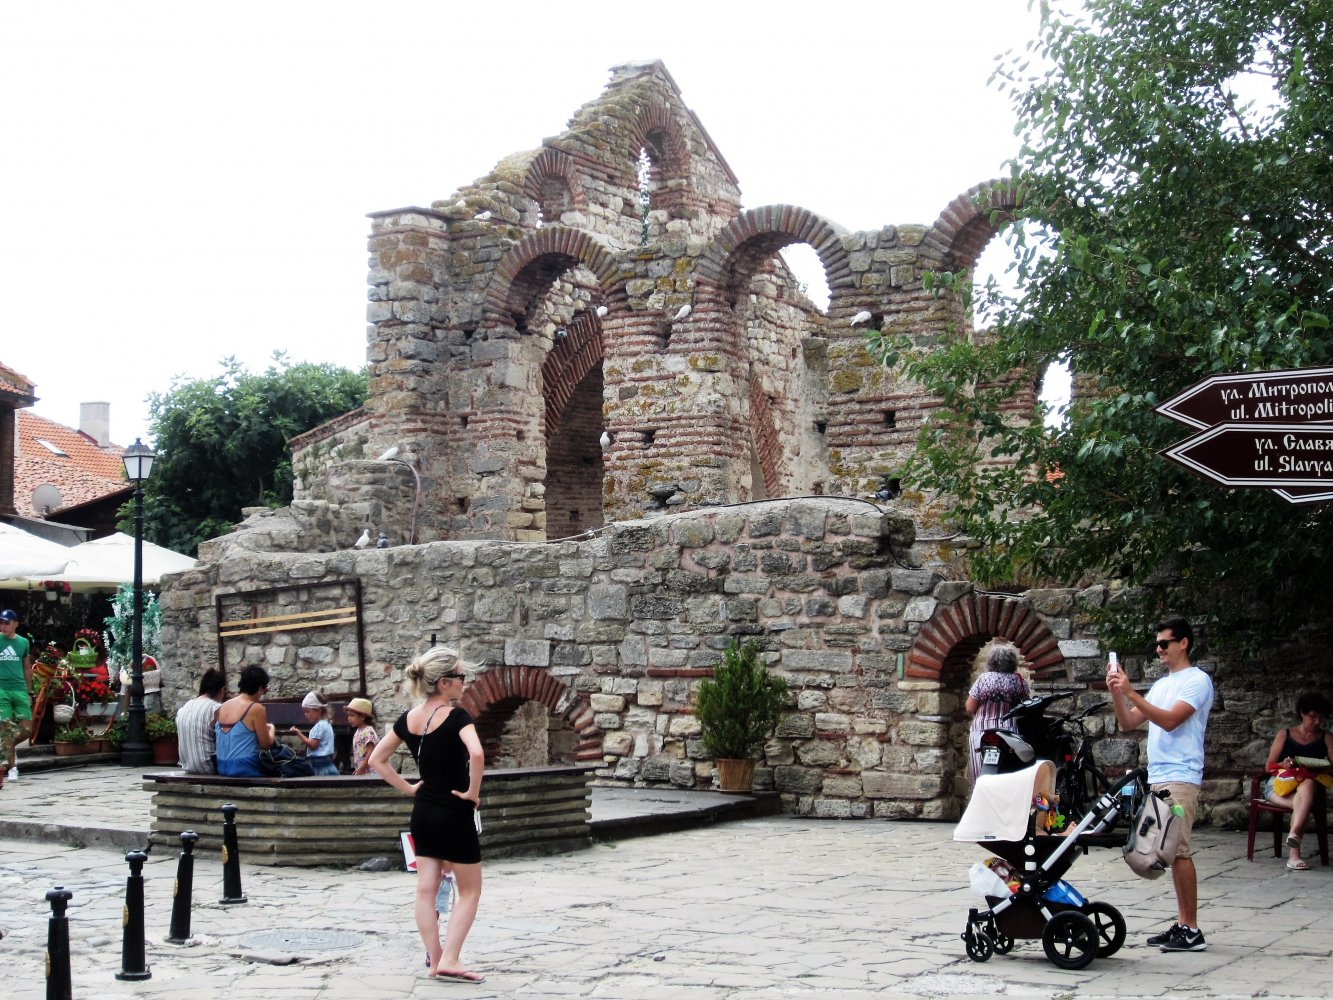 Фото У развалин церкви Святой Софии. Болгария, Бургас, Несебър, 22